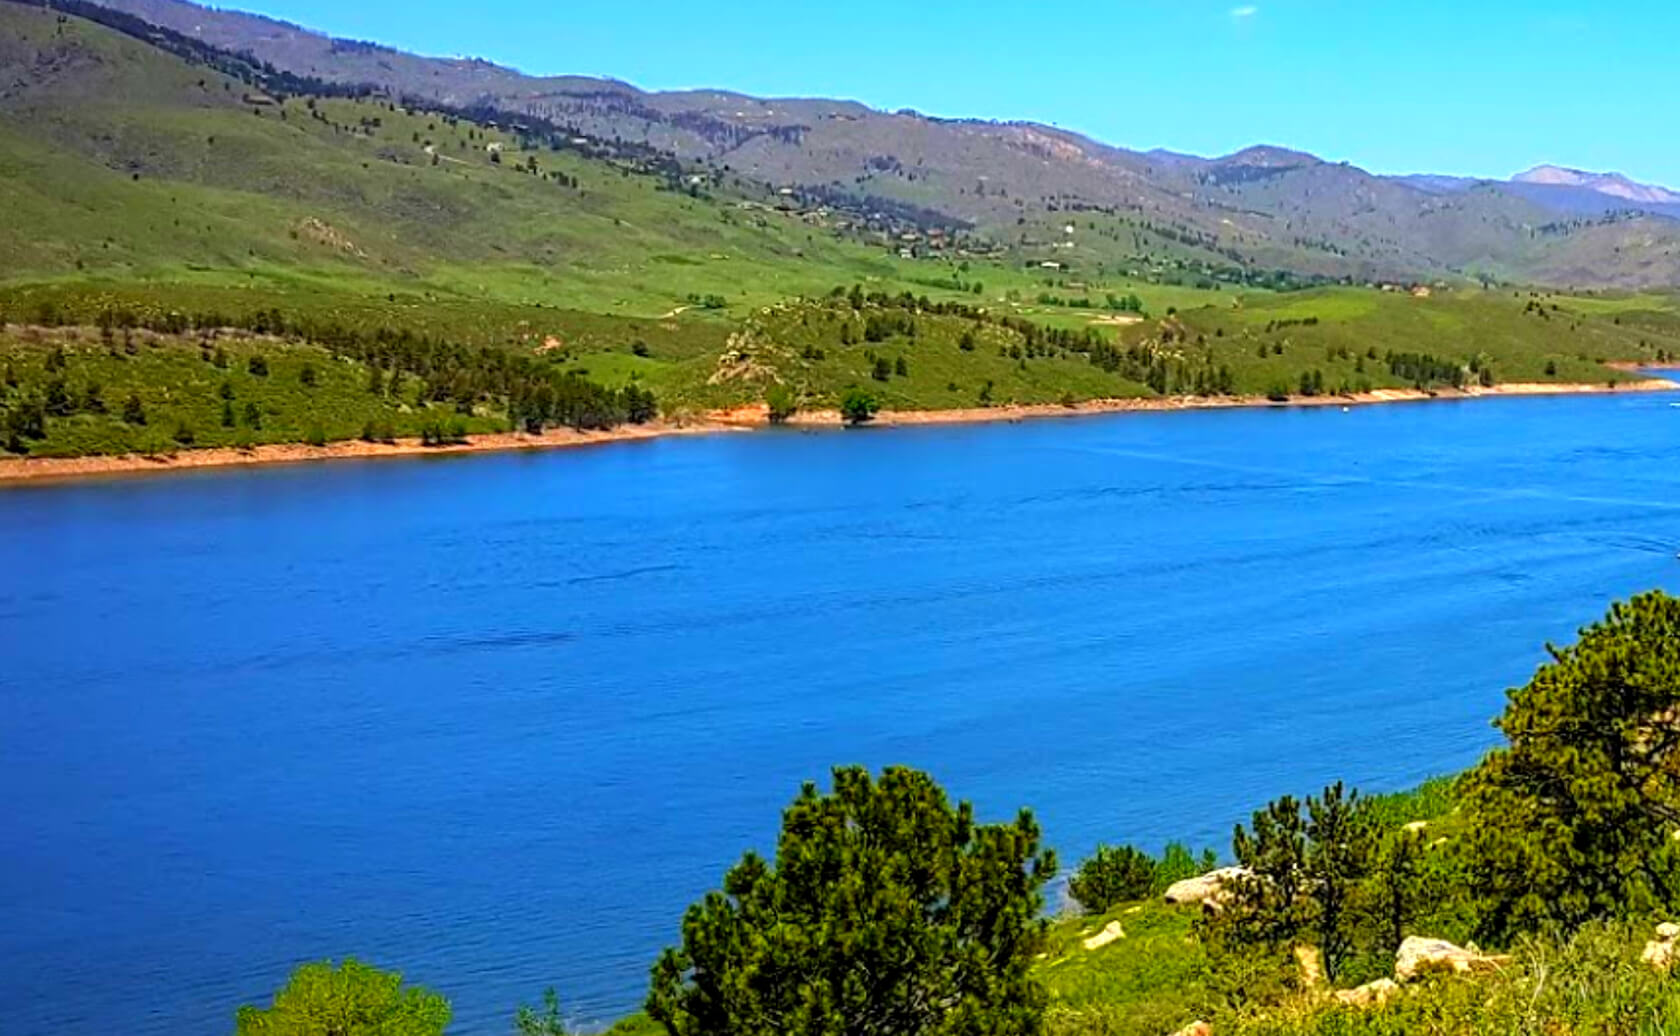 Horsetooth-Lake-Fishing-Guide-Report-Colorado-05